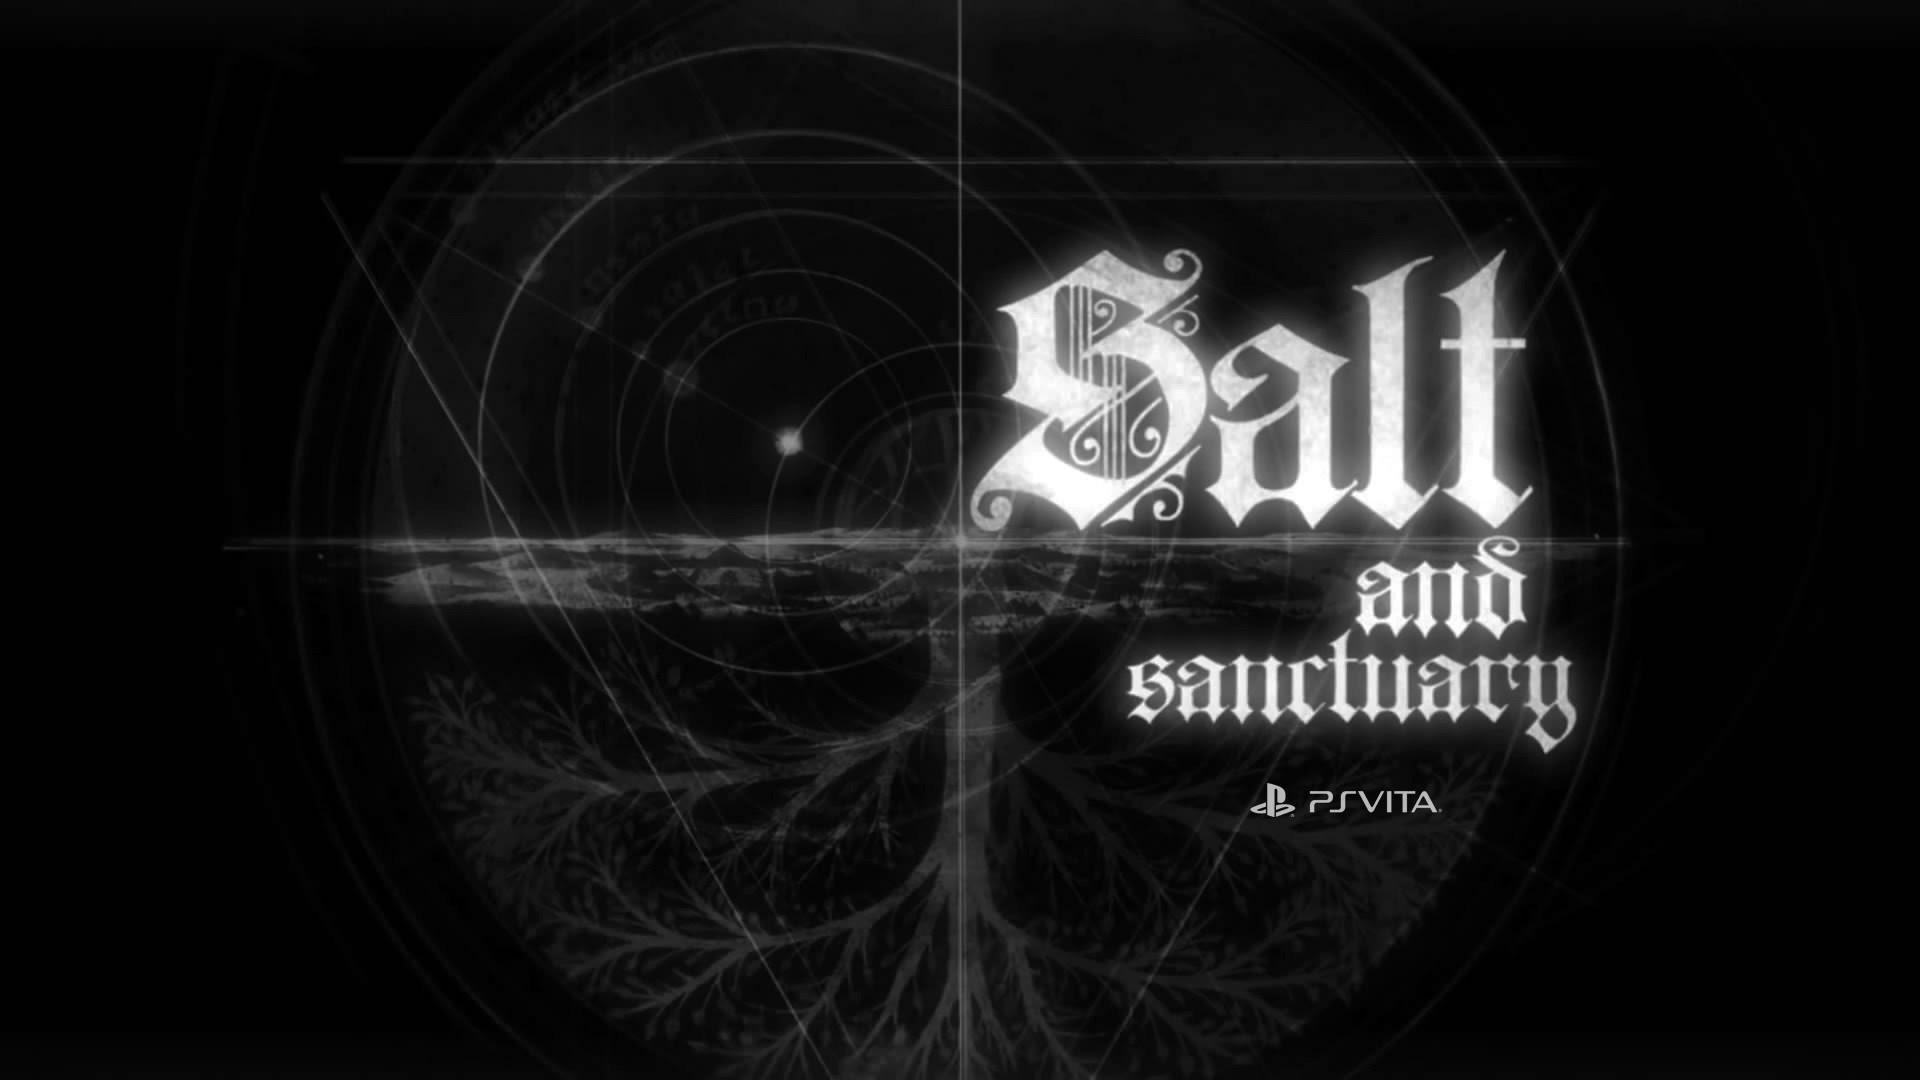 Salt And Sanctuary HD Desktop Wallpapers | 7wallpapers.net